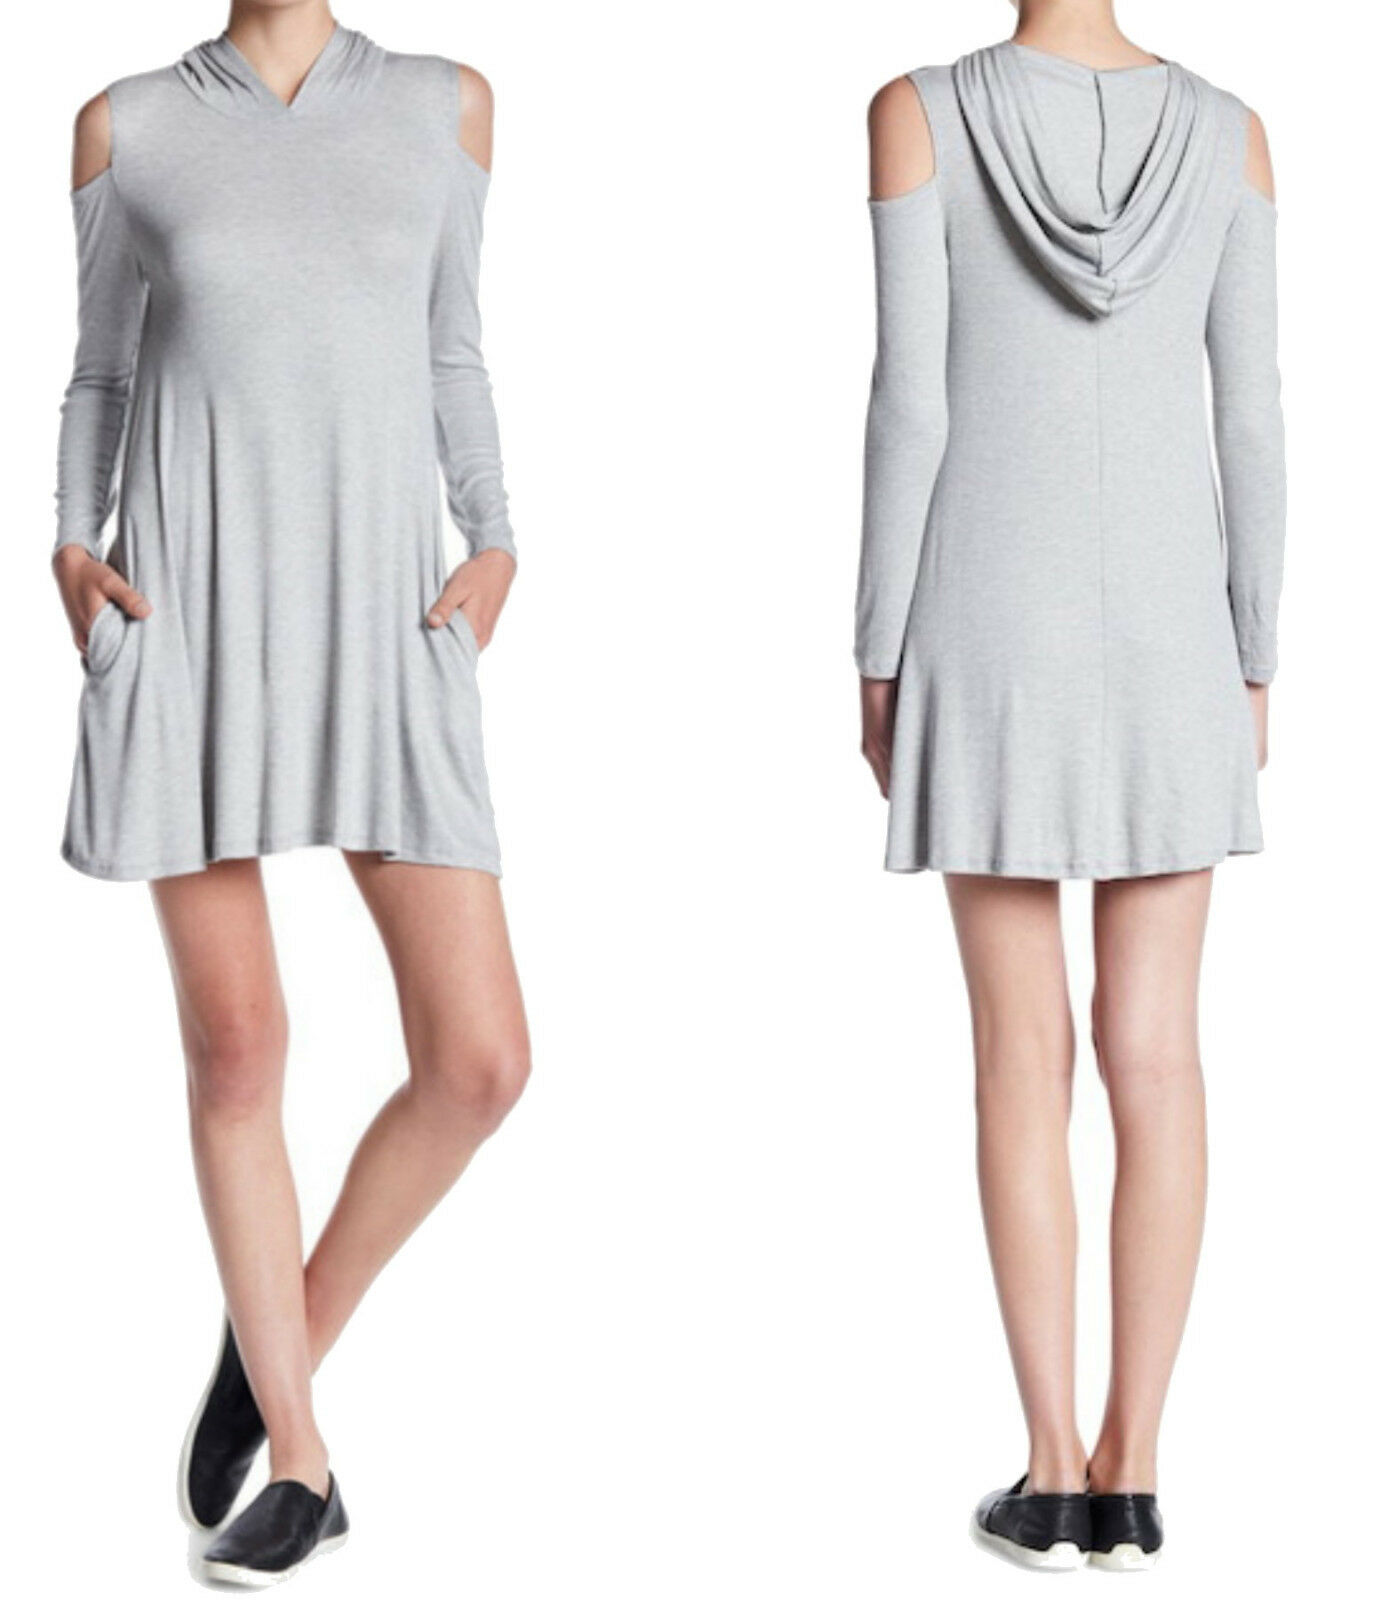 Elan Cold Shoulder Hoodie Dress Medium 6 8 grau 2 Pockets Long Sleeve Shift NWT